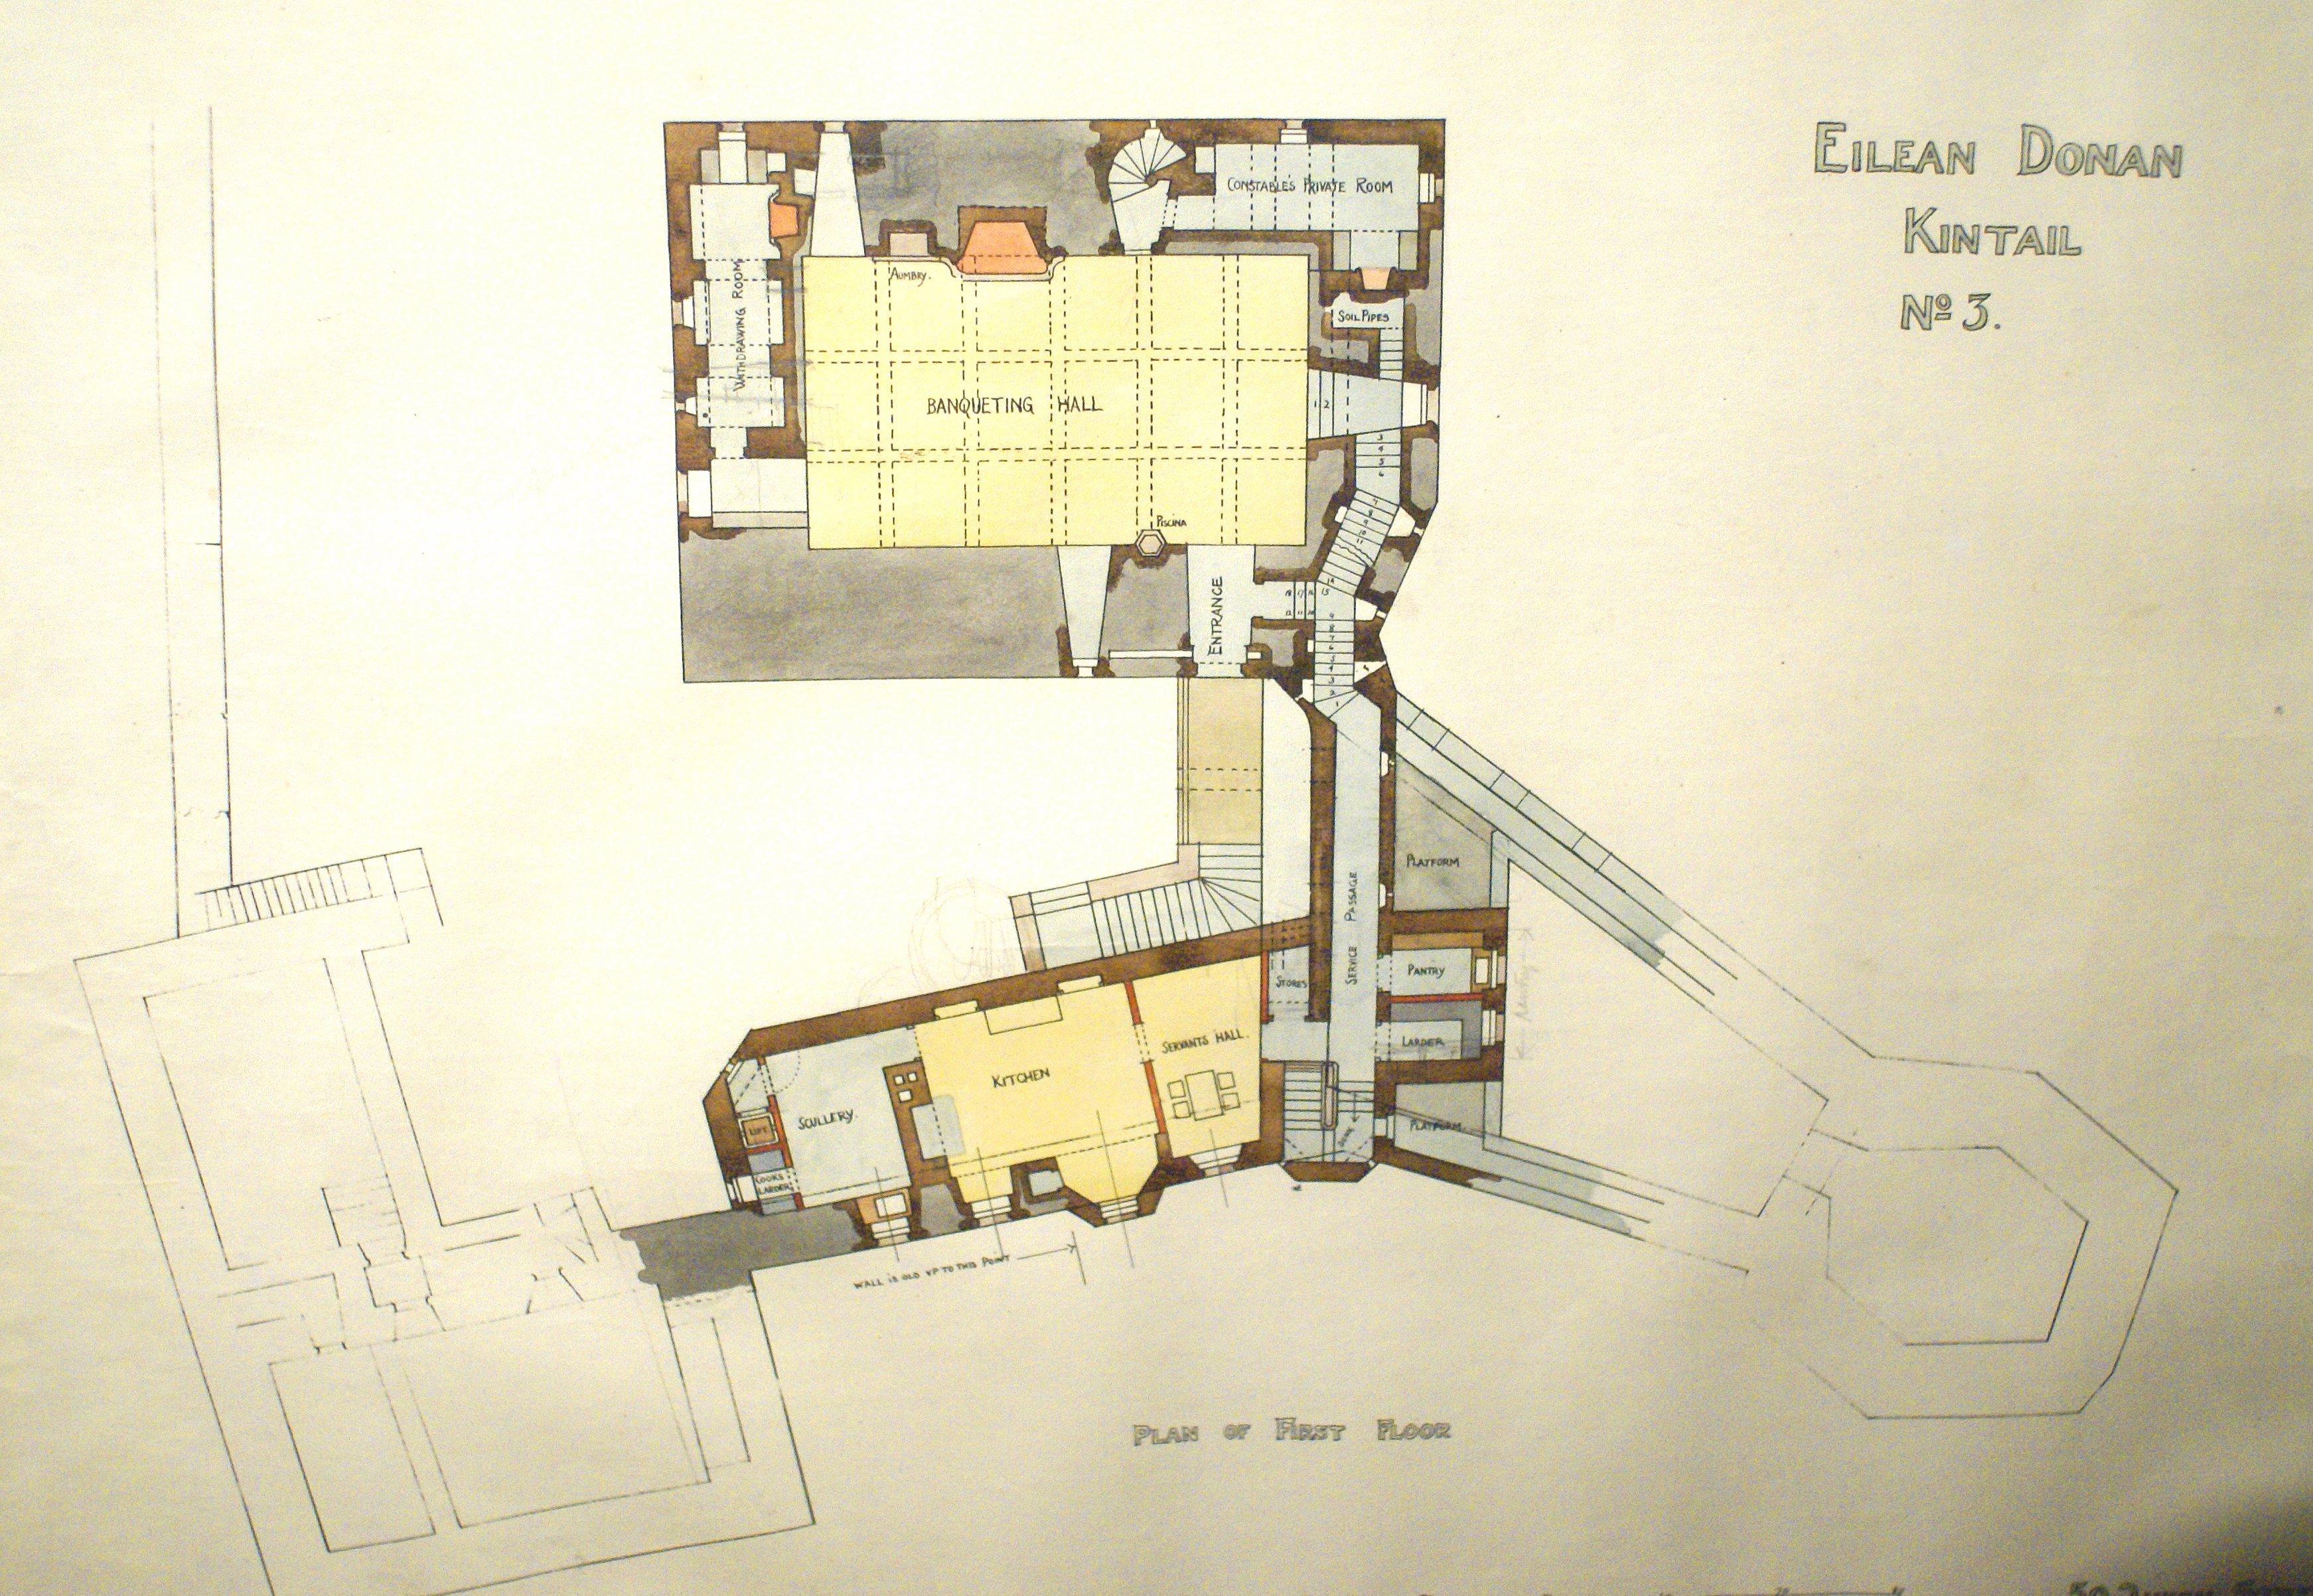 The Best Laid Plans Eilean Donan Simple Engine Diagram Images Pictures Becuo